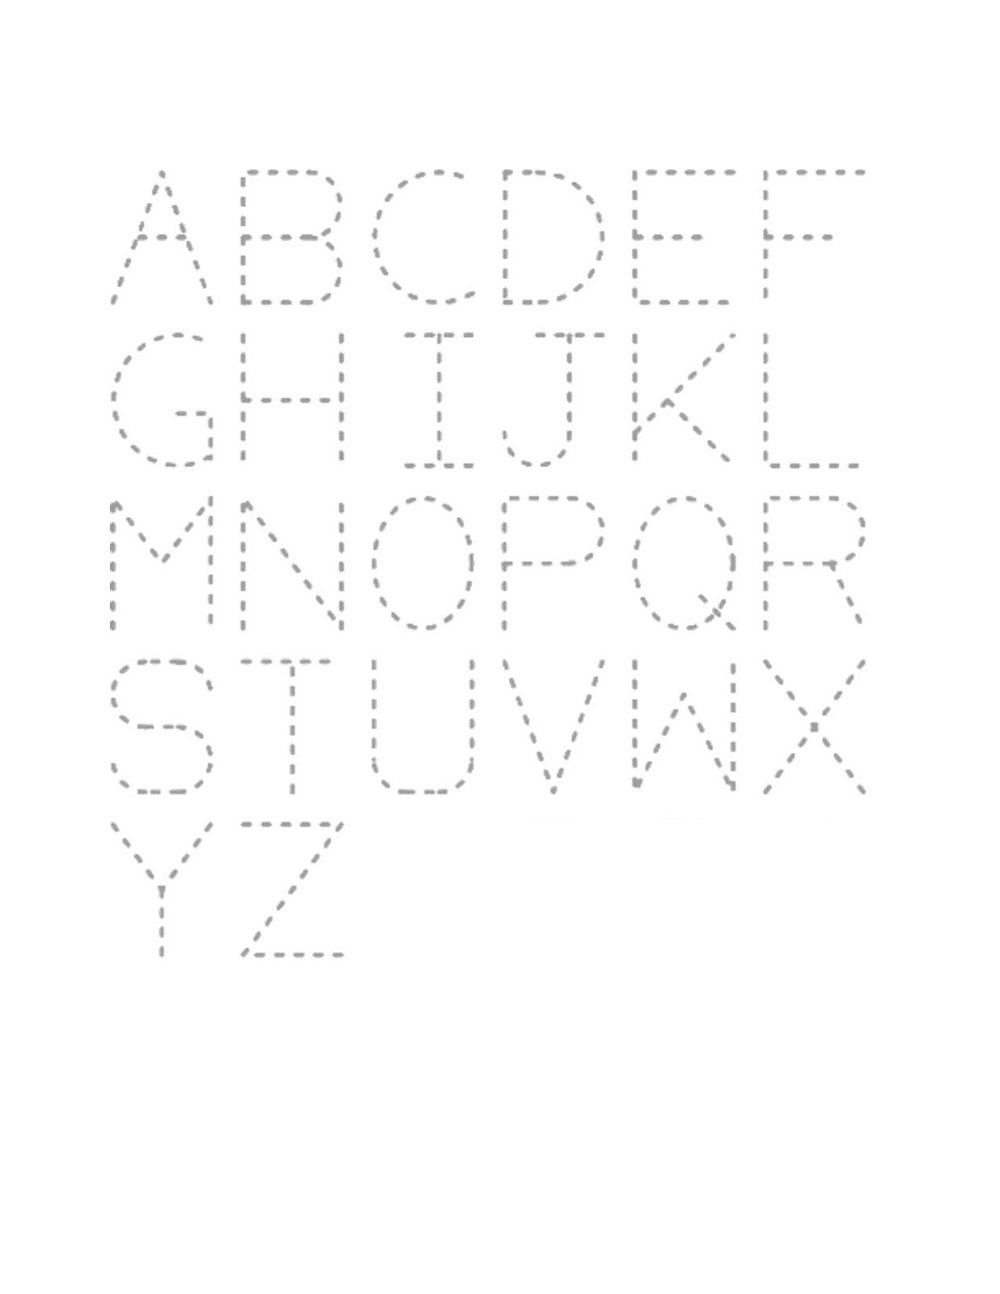 Tracing Worksheets 3 Year Old Fun | Kiddo Shelter | Printable Tracing Worksheets For 3 Year Olds